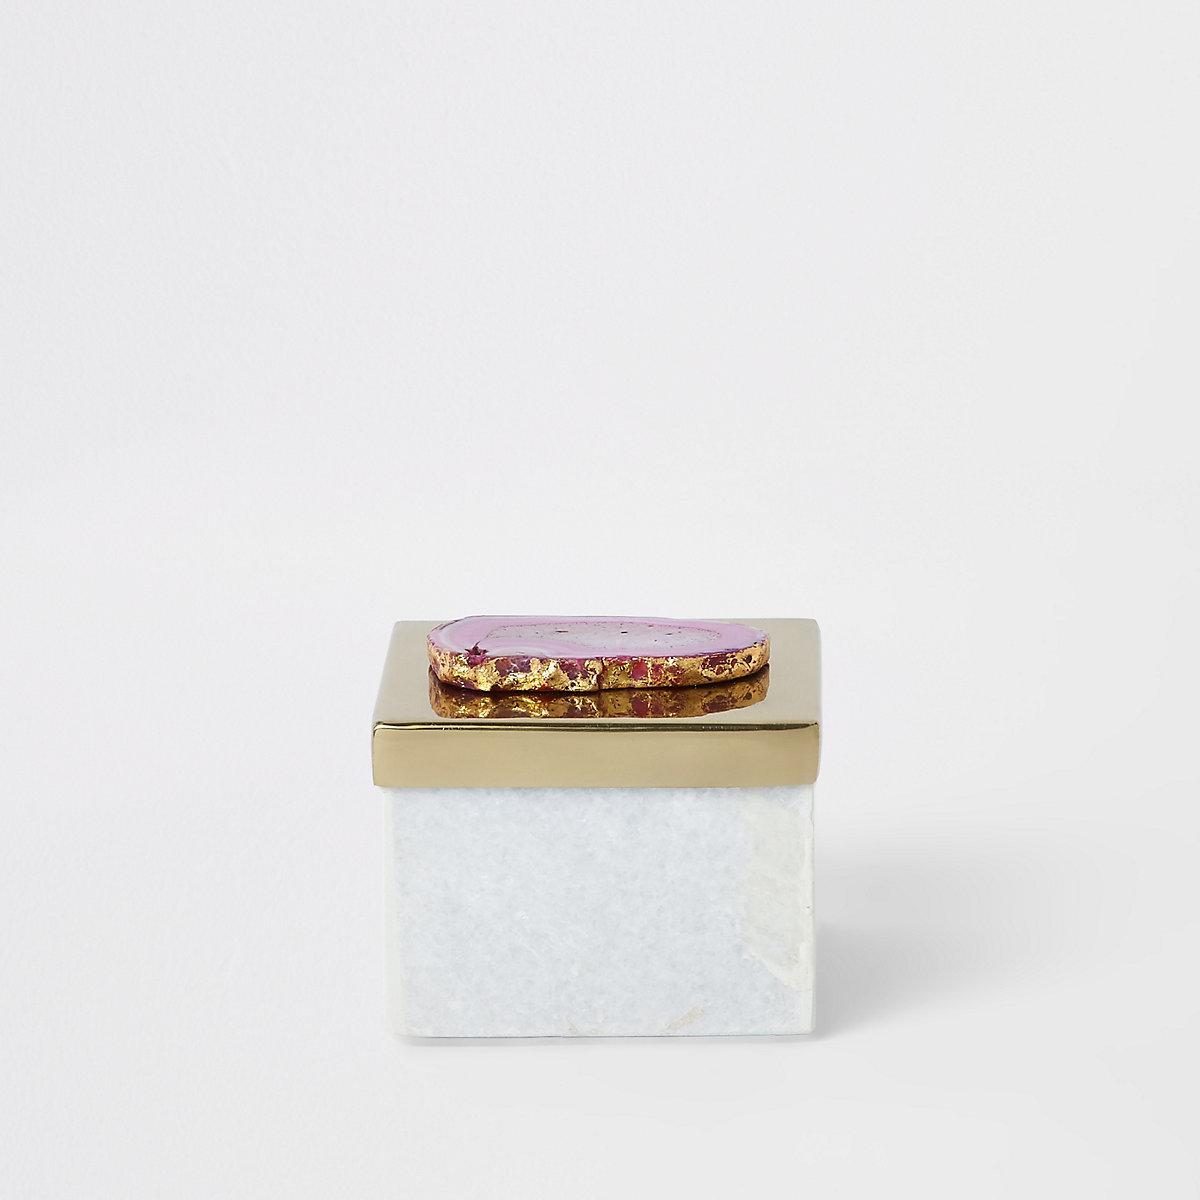 Marble storage box with agate metal lid